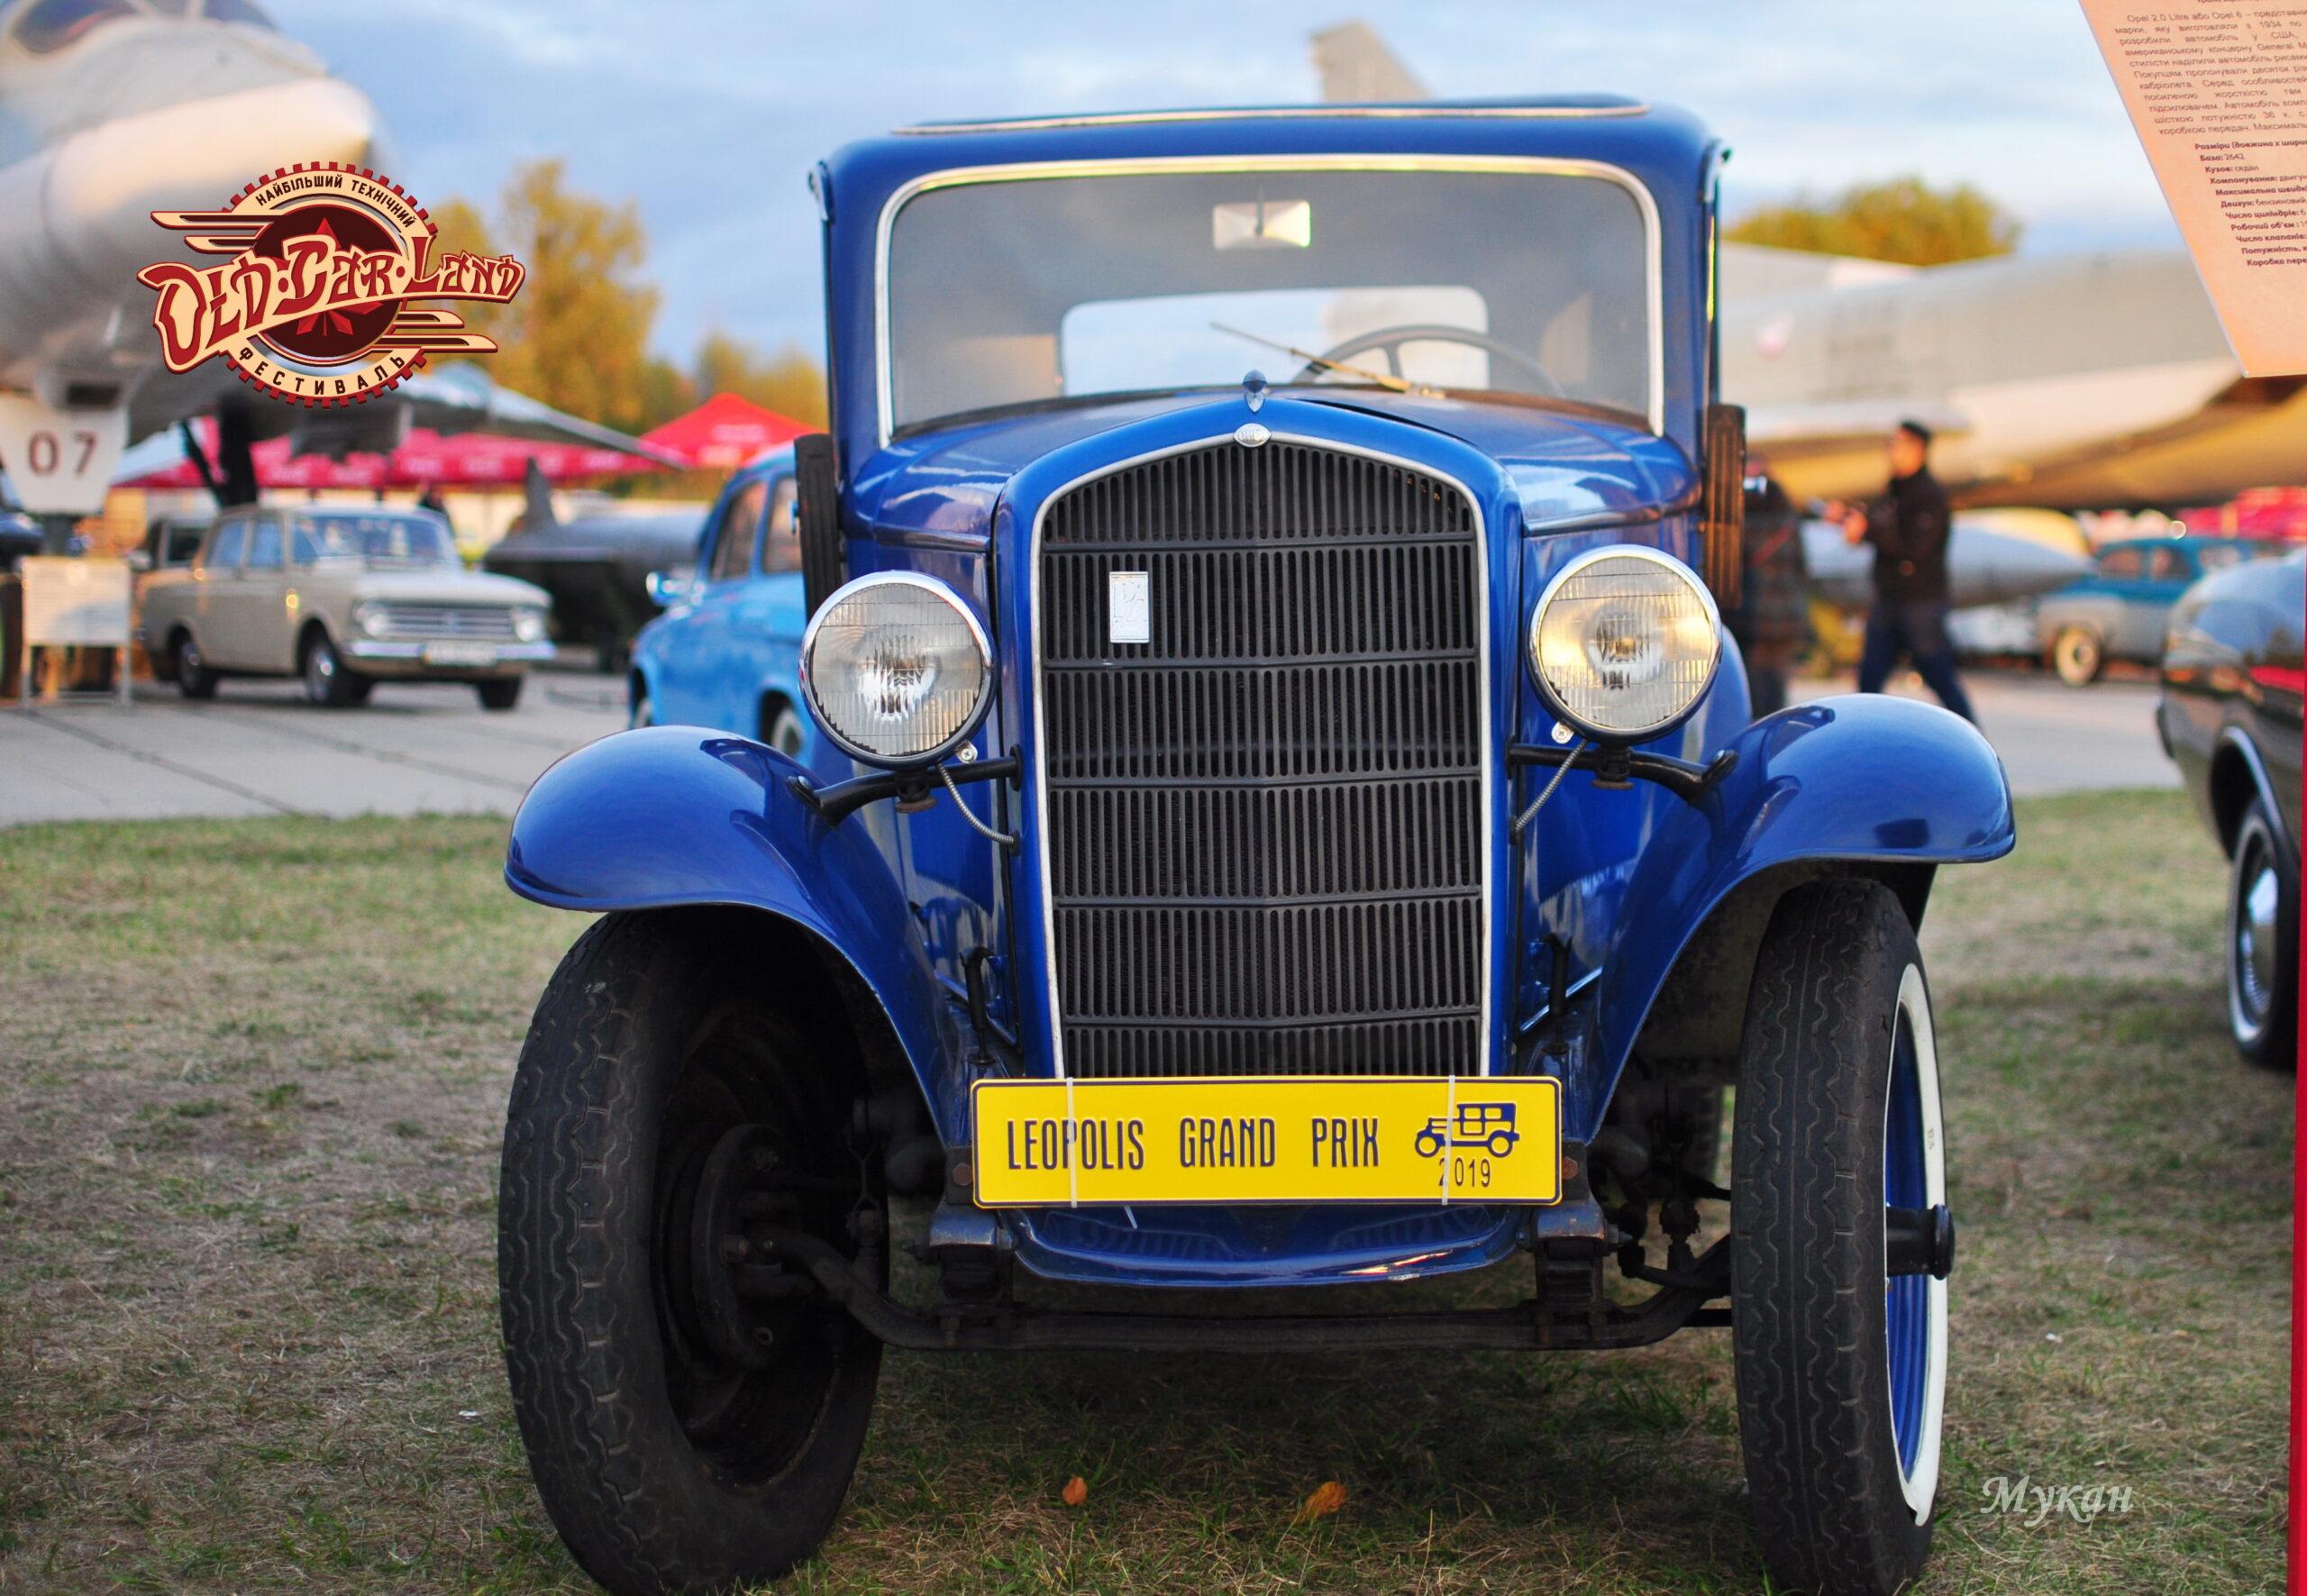 7 найцікавіших машин фестивалю OldCarLand.Вокруг Света. Украина